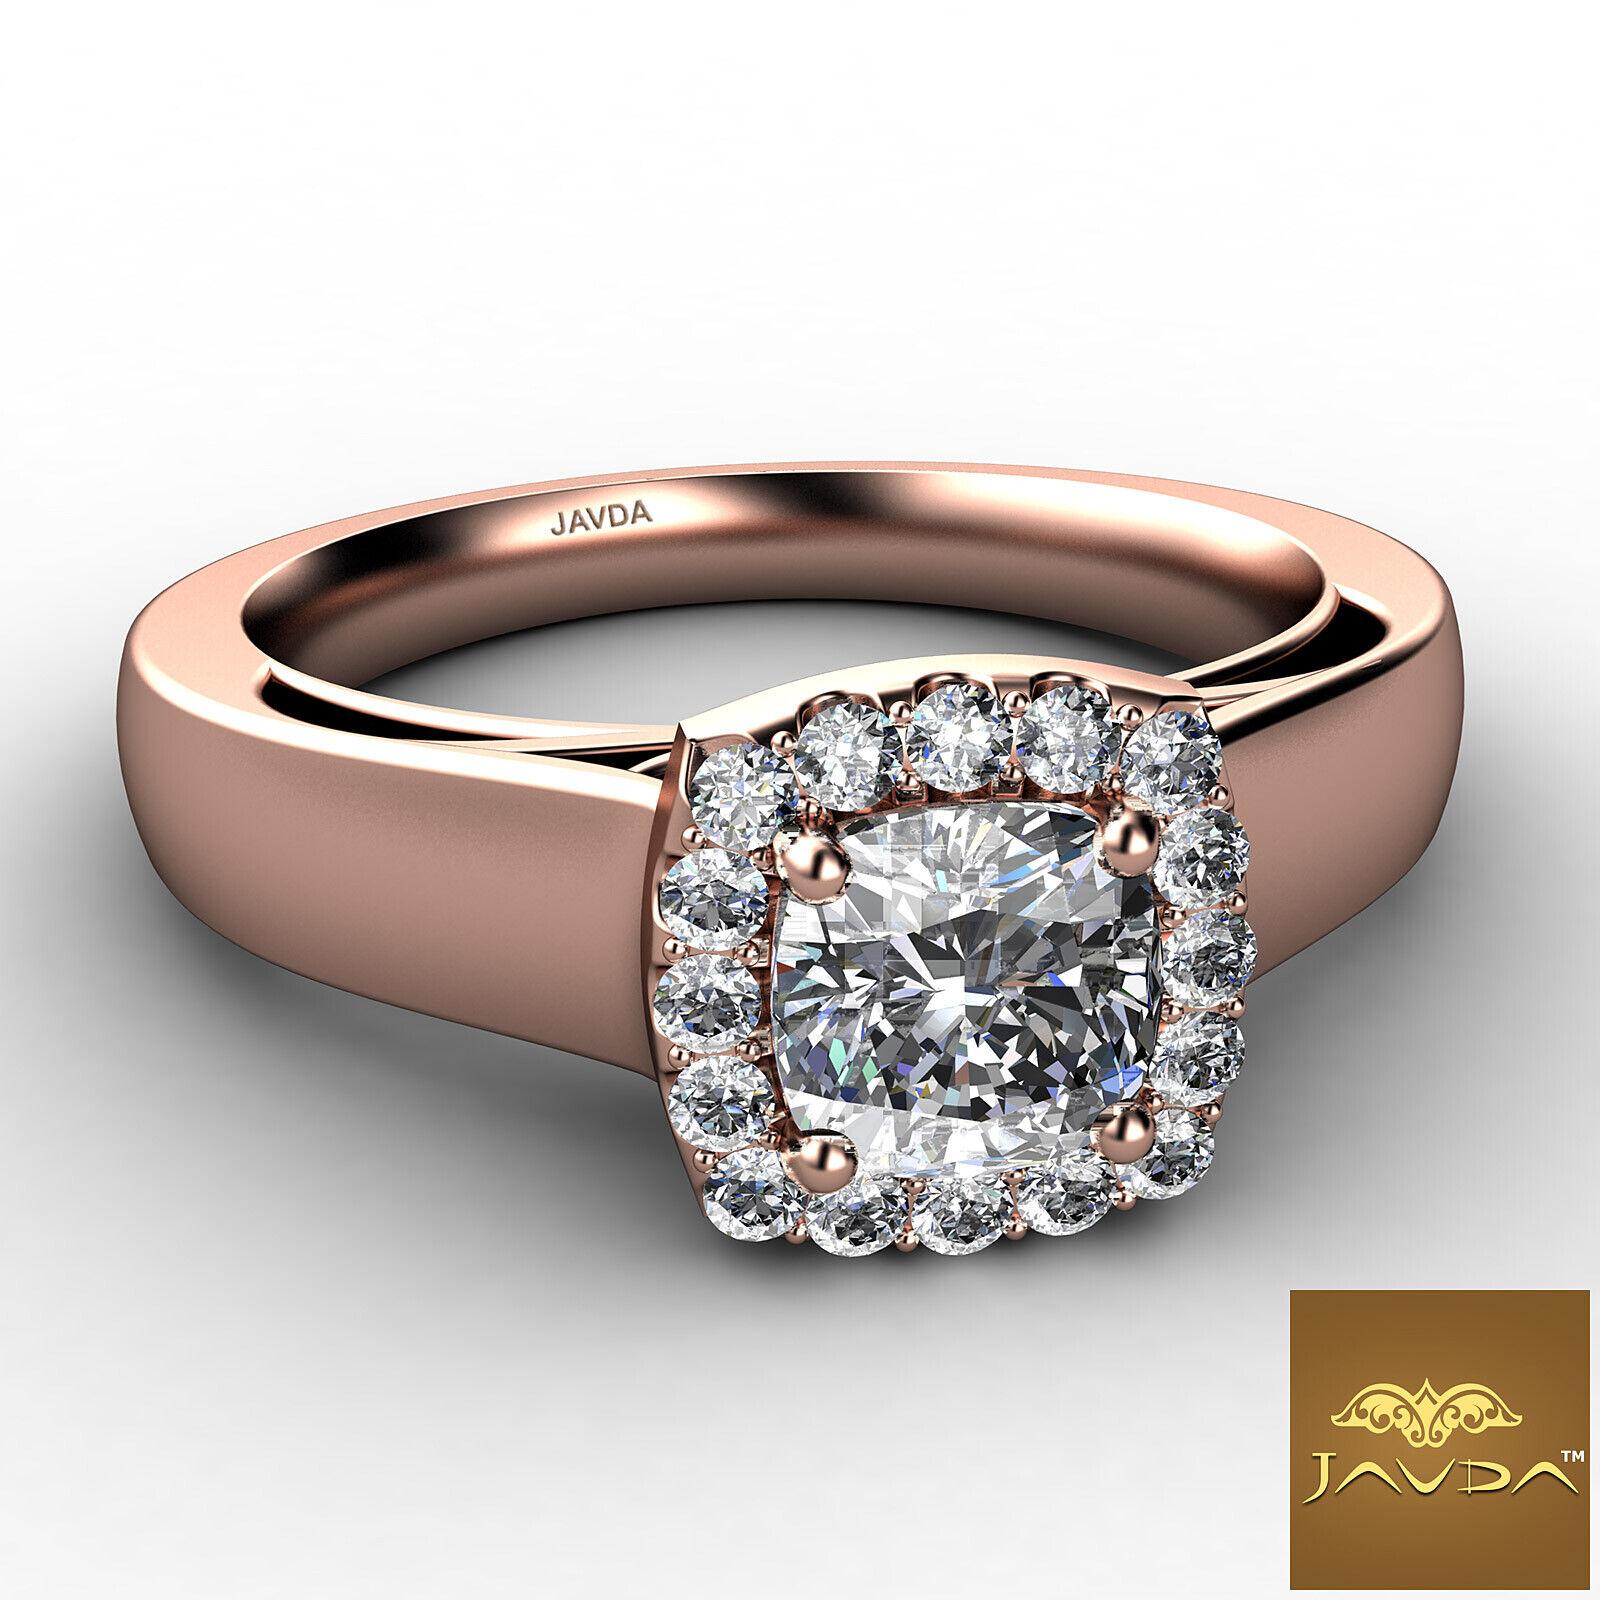 Filigree Shank U Cut Prong Cushion Diamond Engagement GIA H Color VS1 Ring 0.7Ct 9